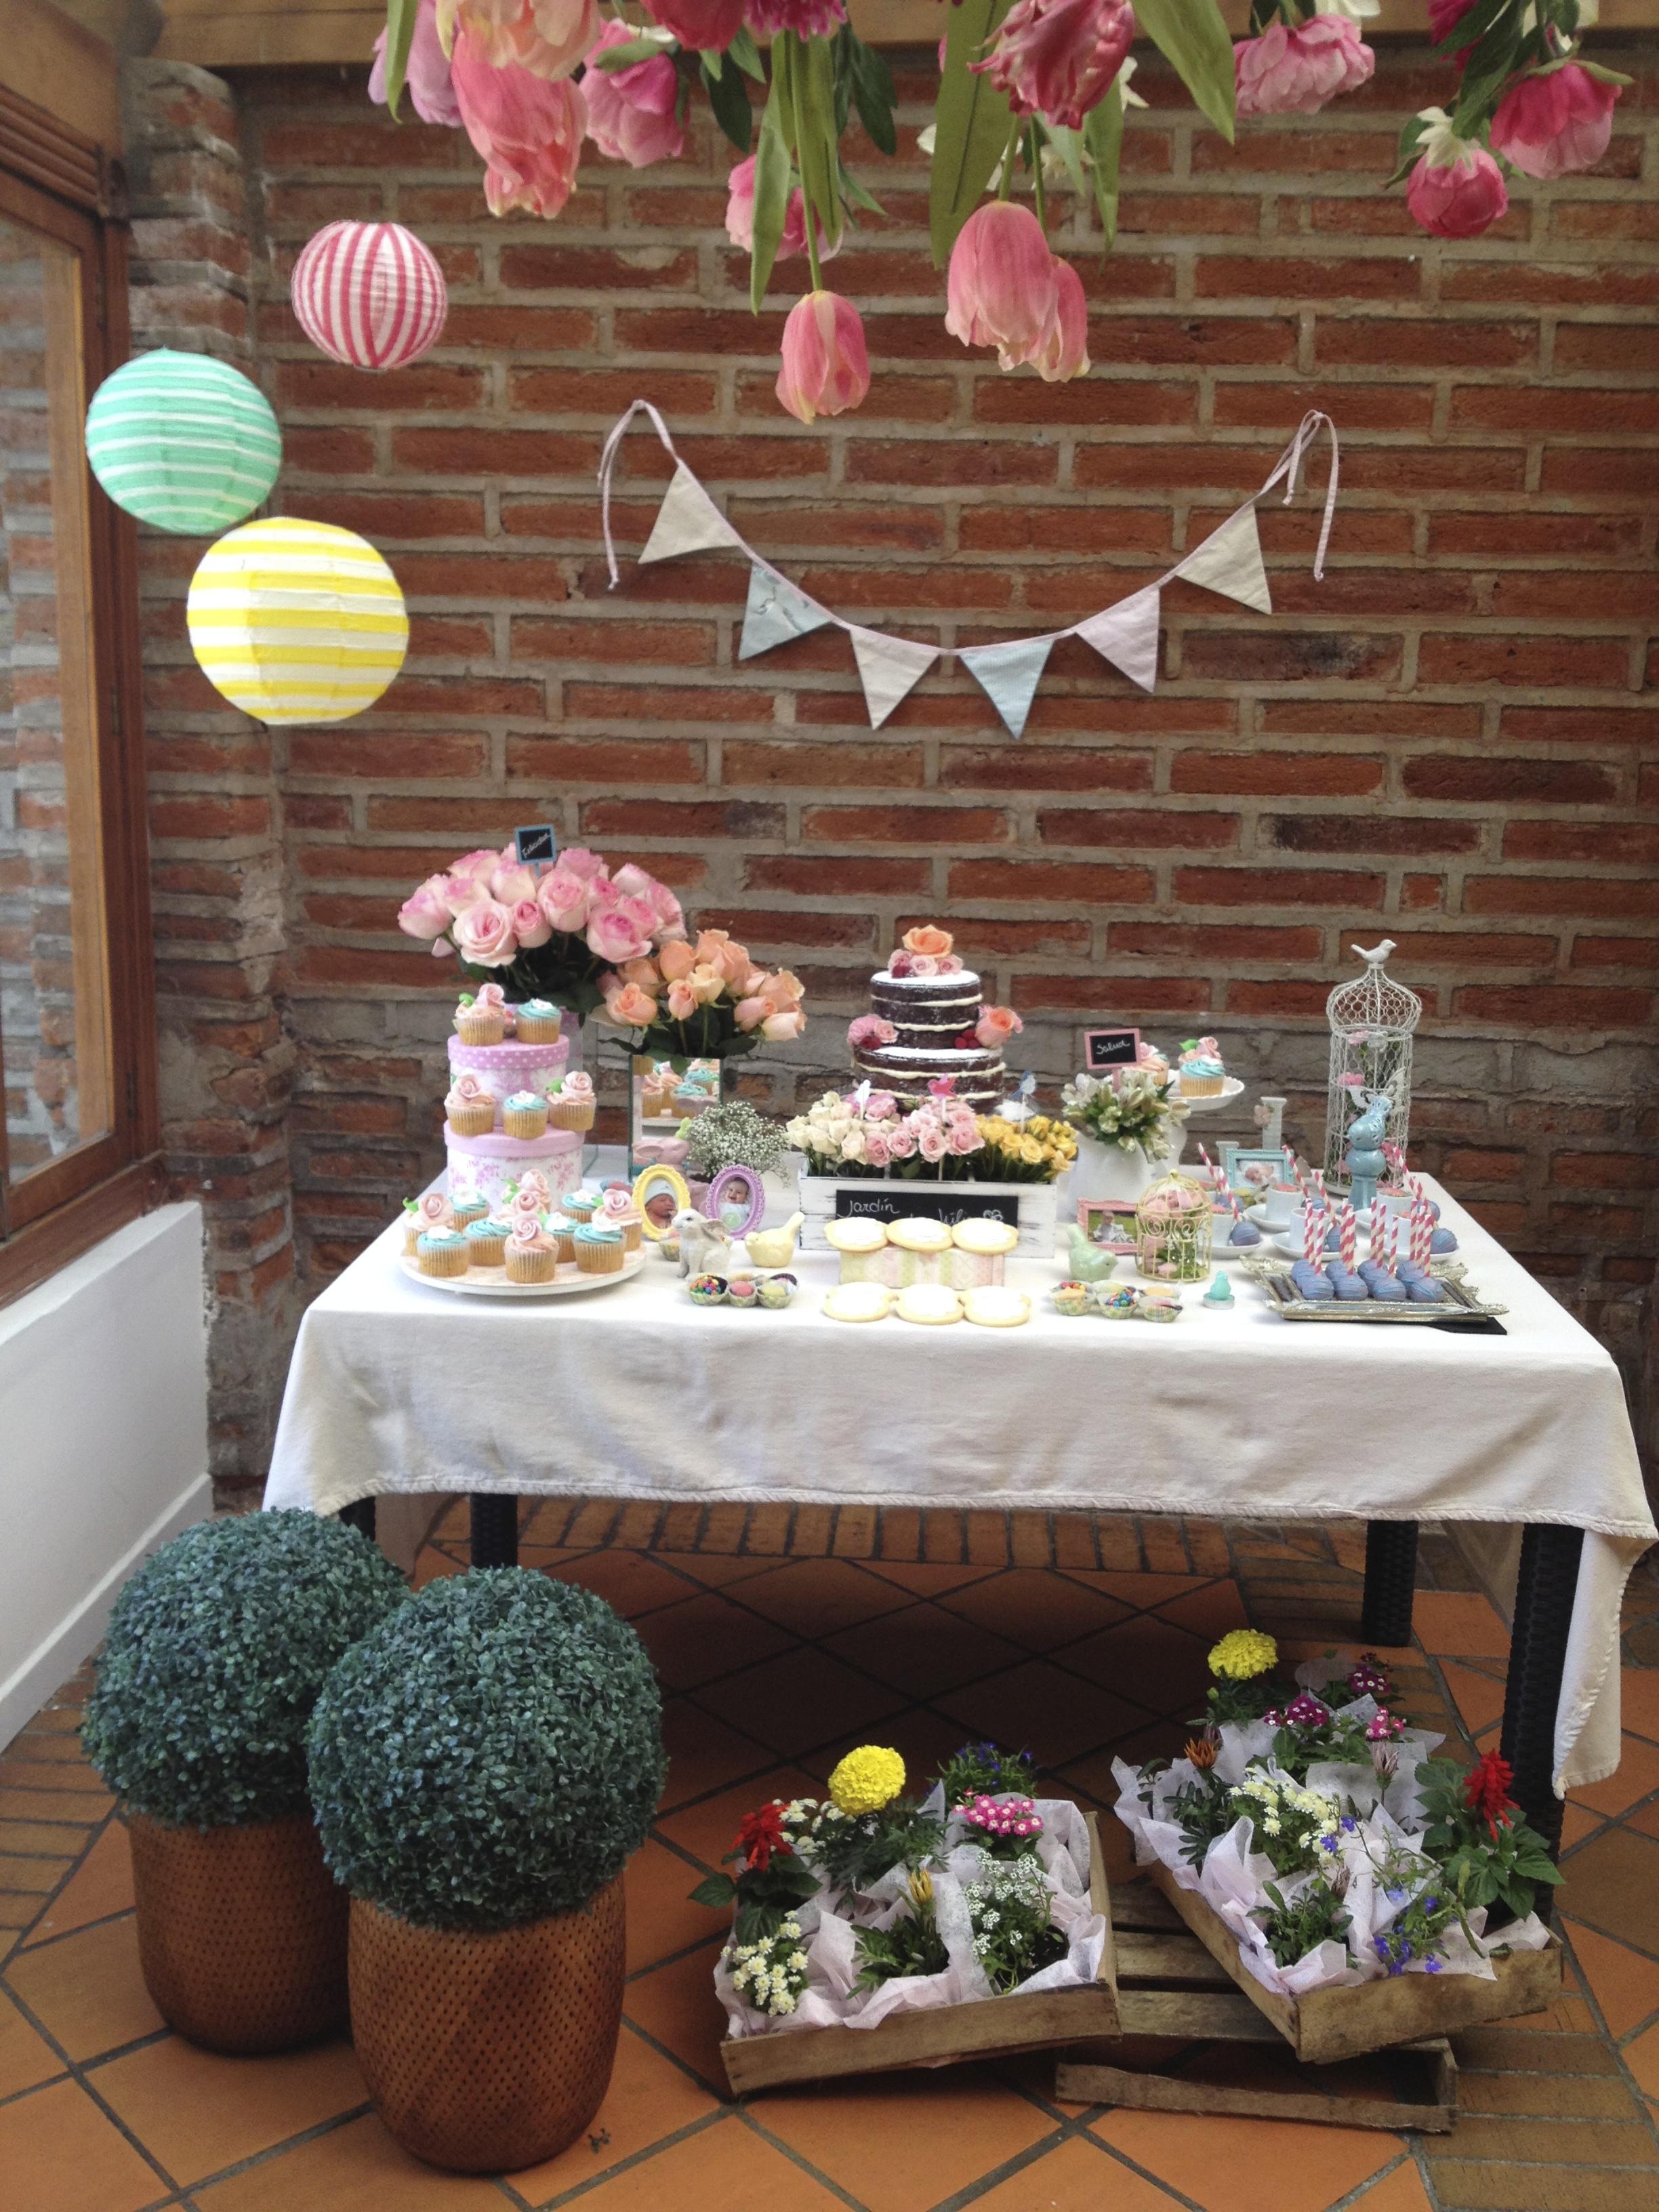 Fiesta primer cumplea os bienvenidos al jard n de j lia for Fiesta de jardin